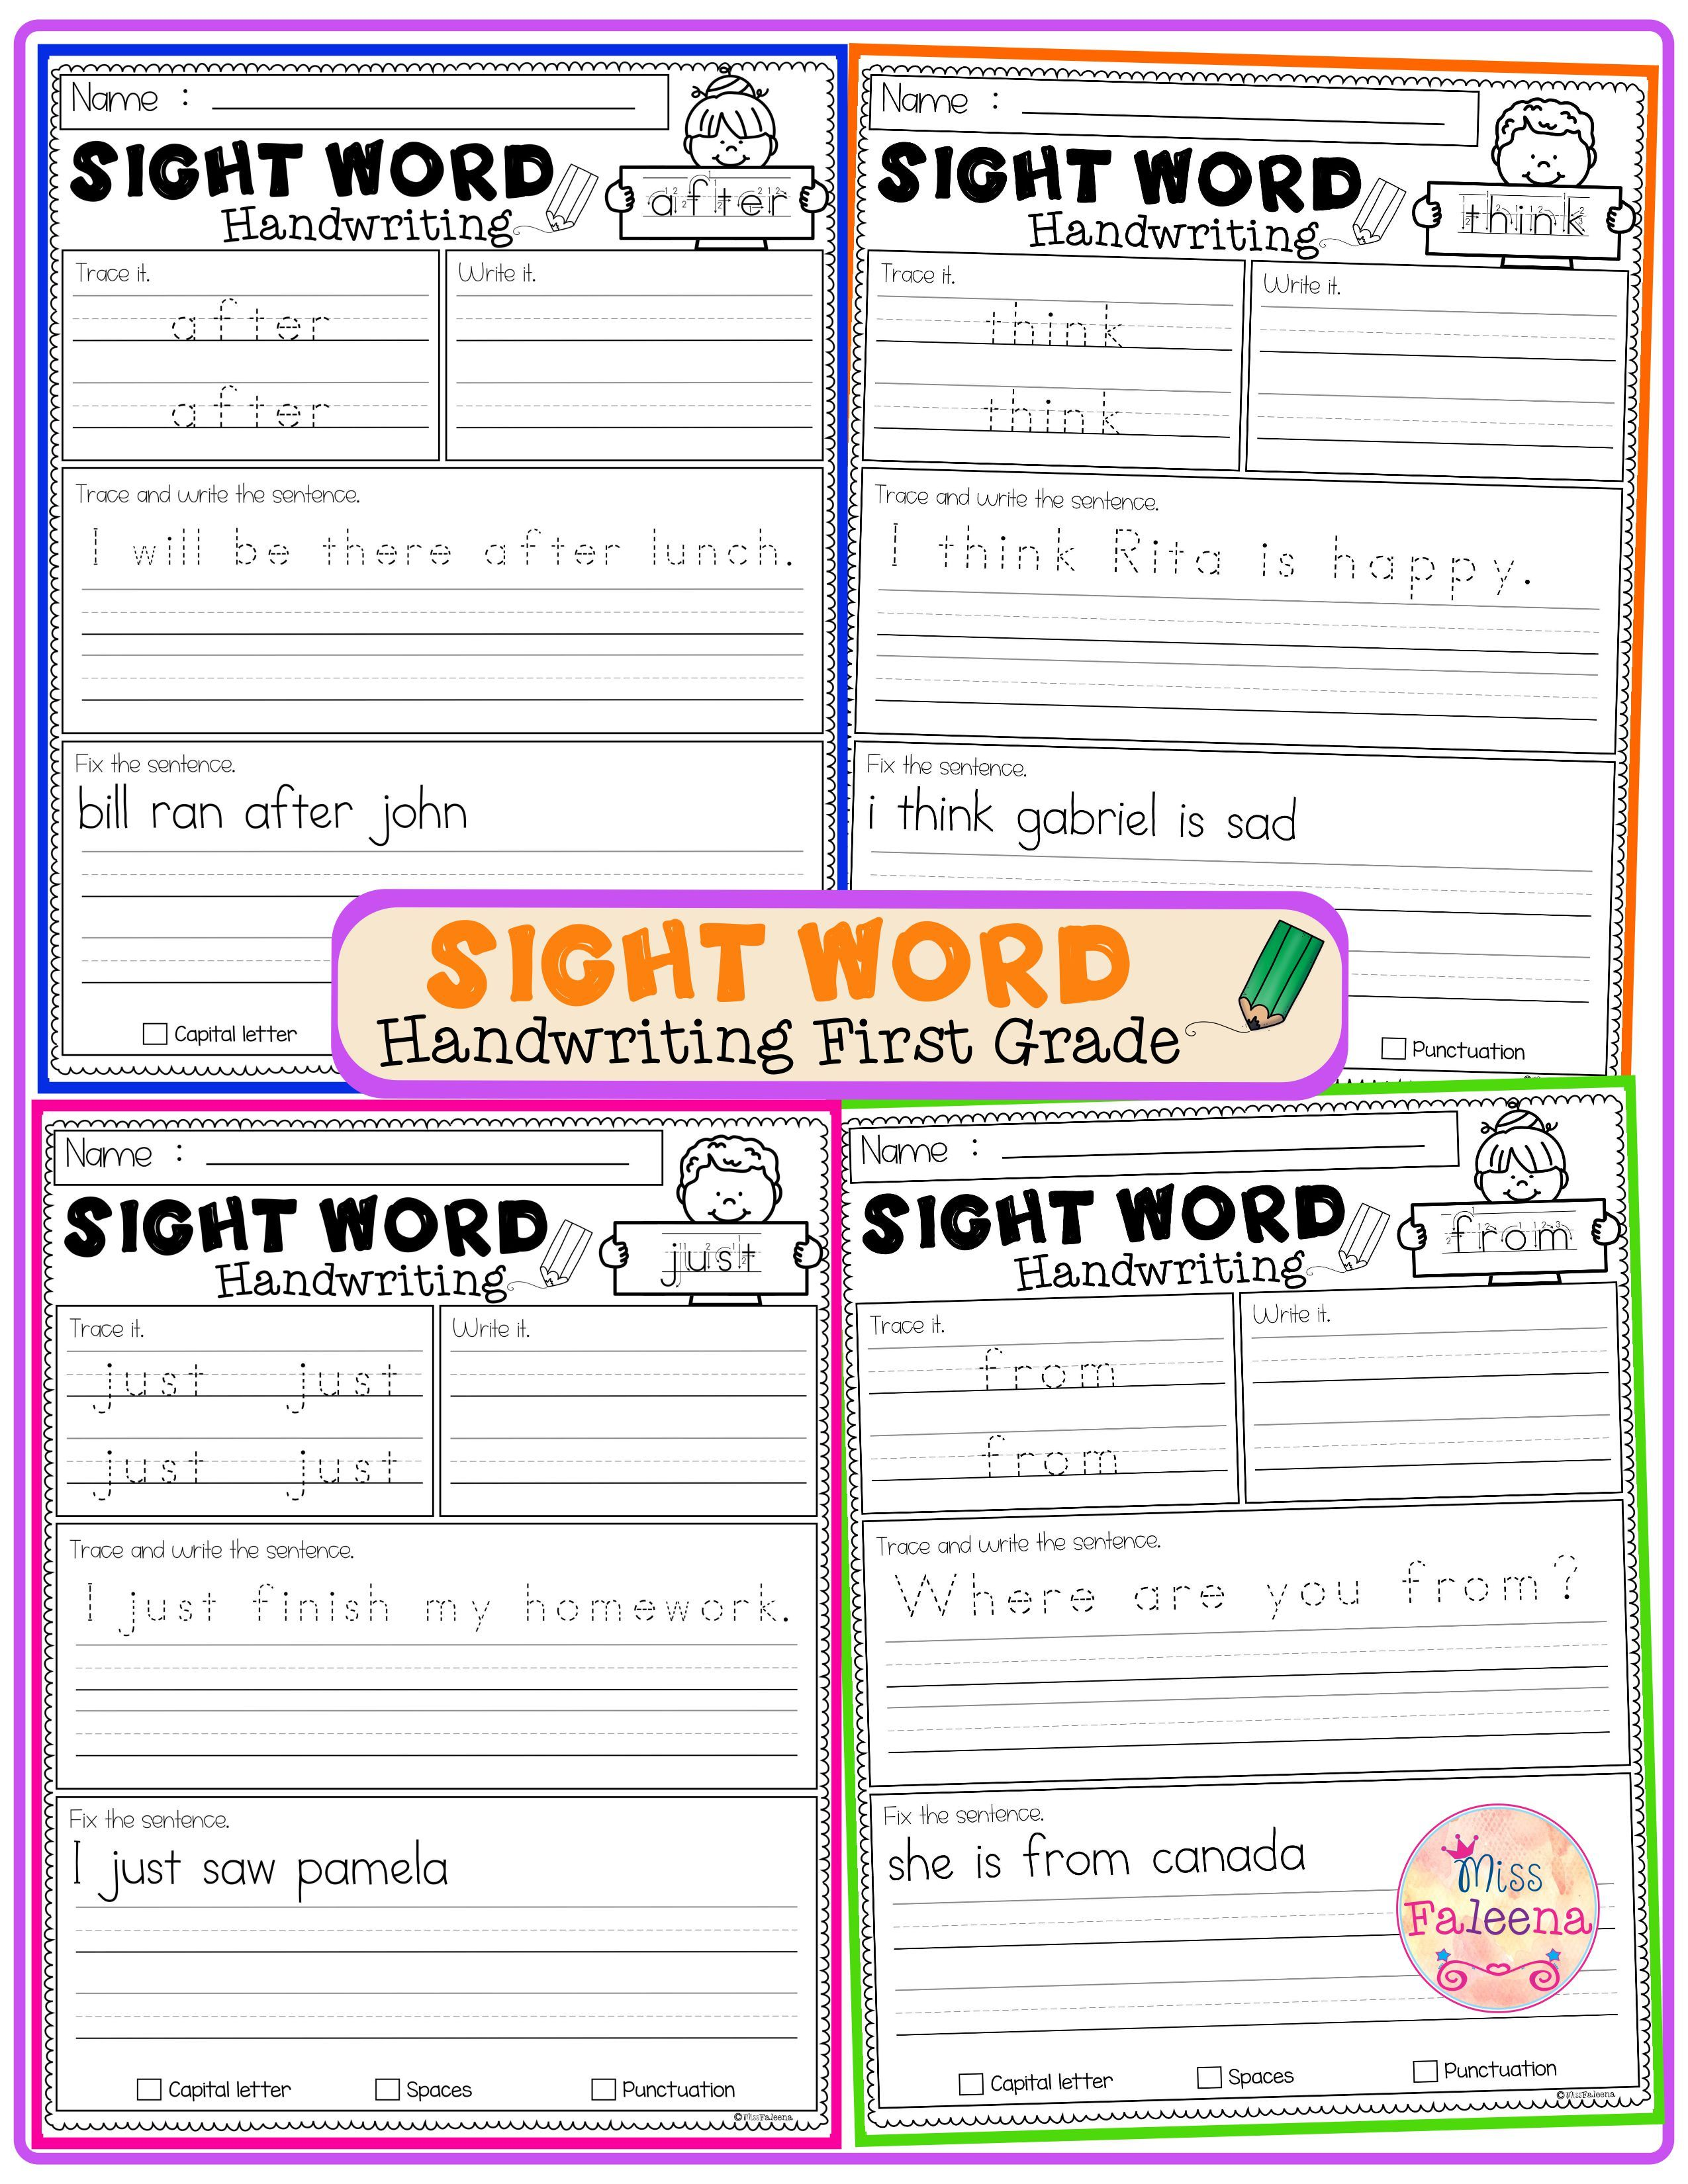 Sight Word Handwriting